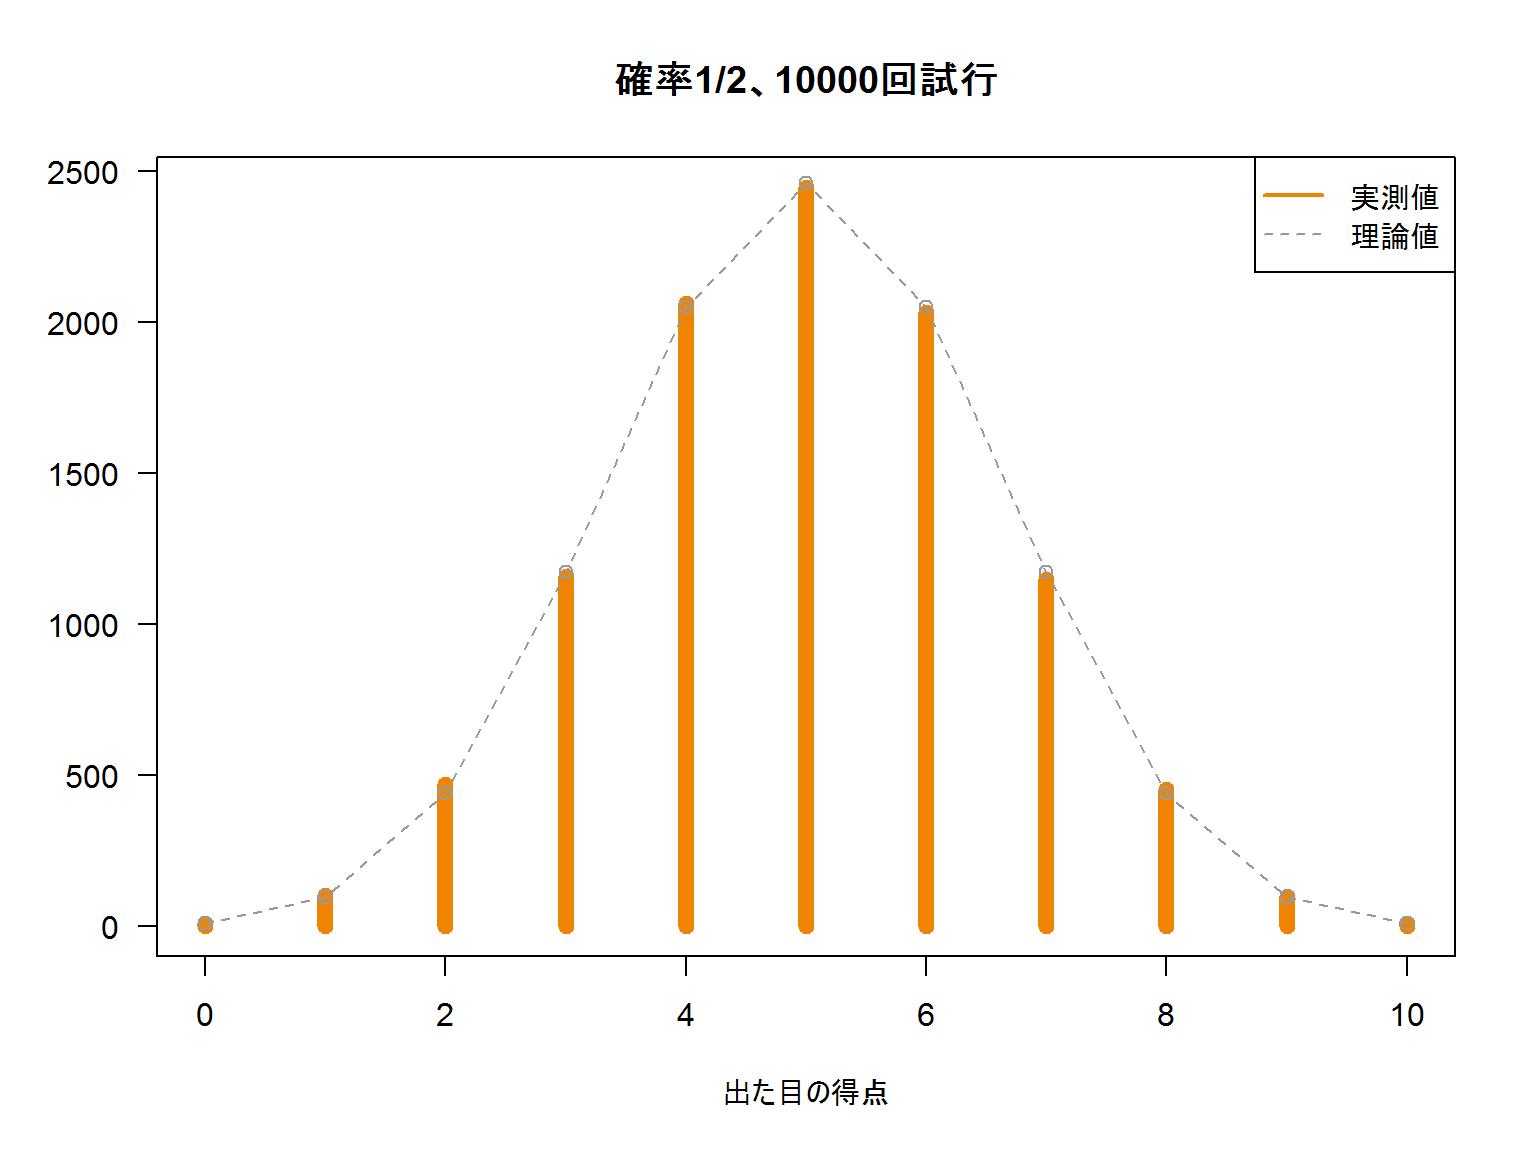 binom_test_1-1